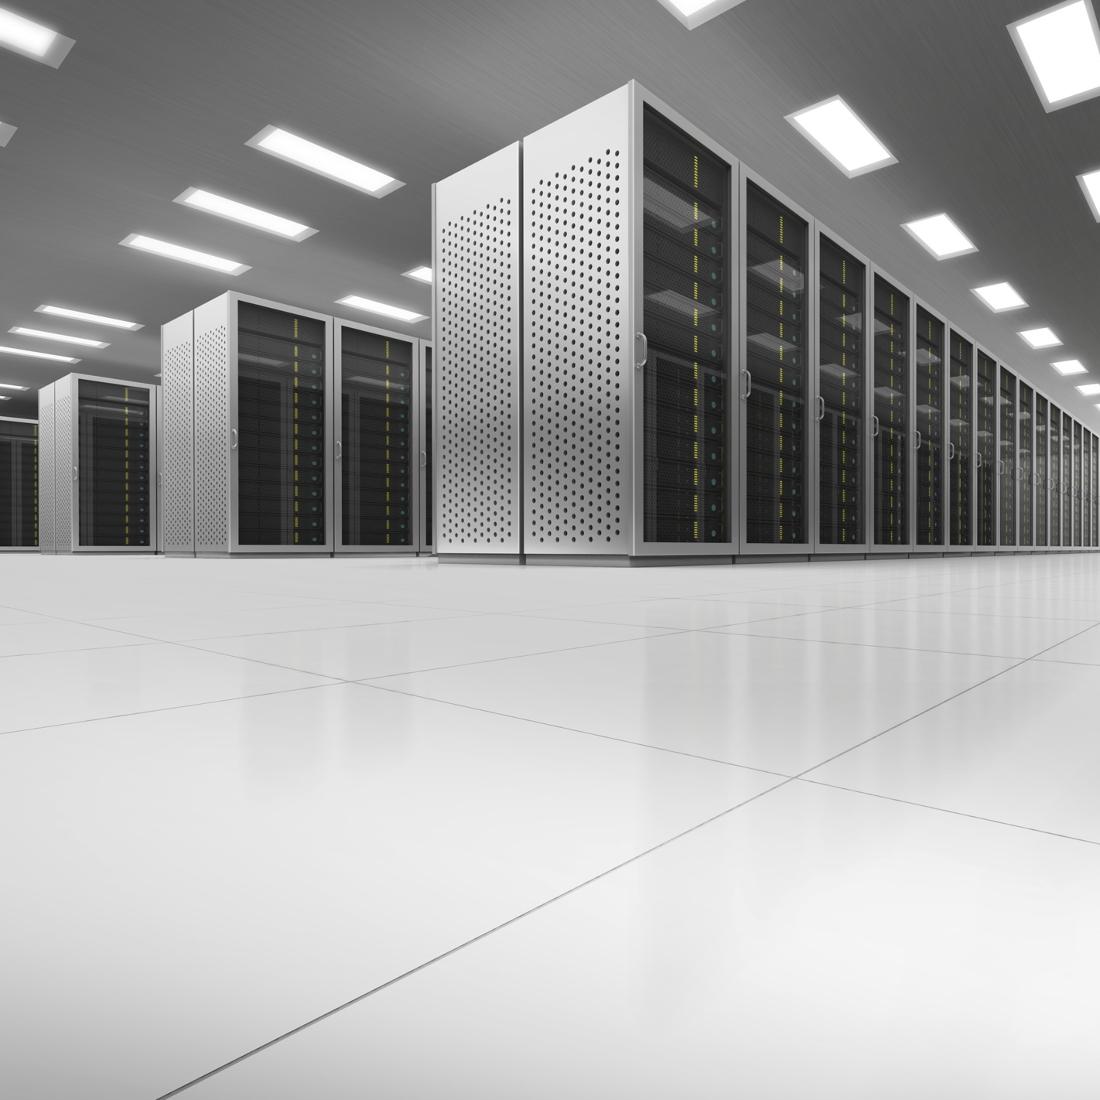 RO RANKS WORLDWIDE IN DATA CENTER CONSTRUCTION